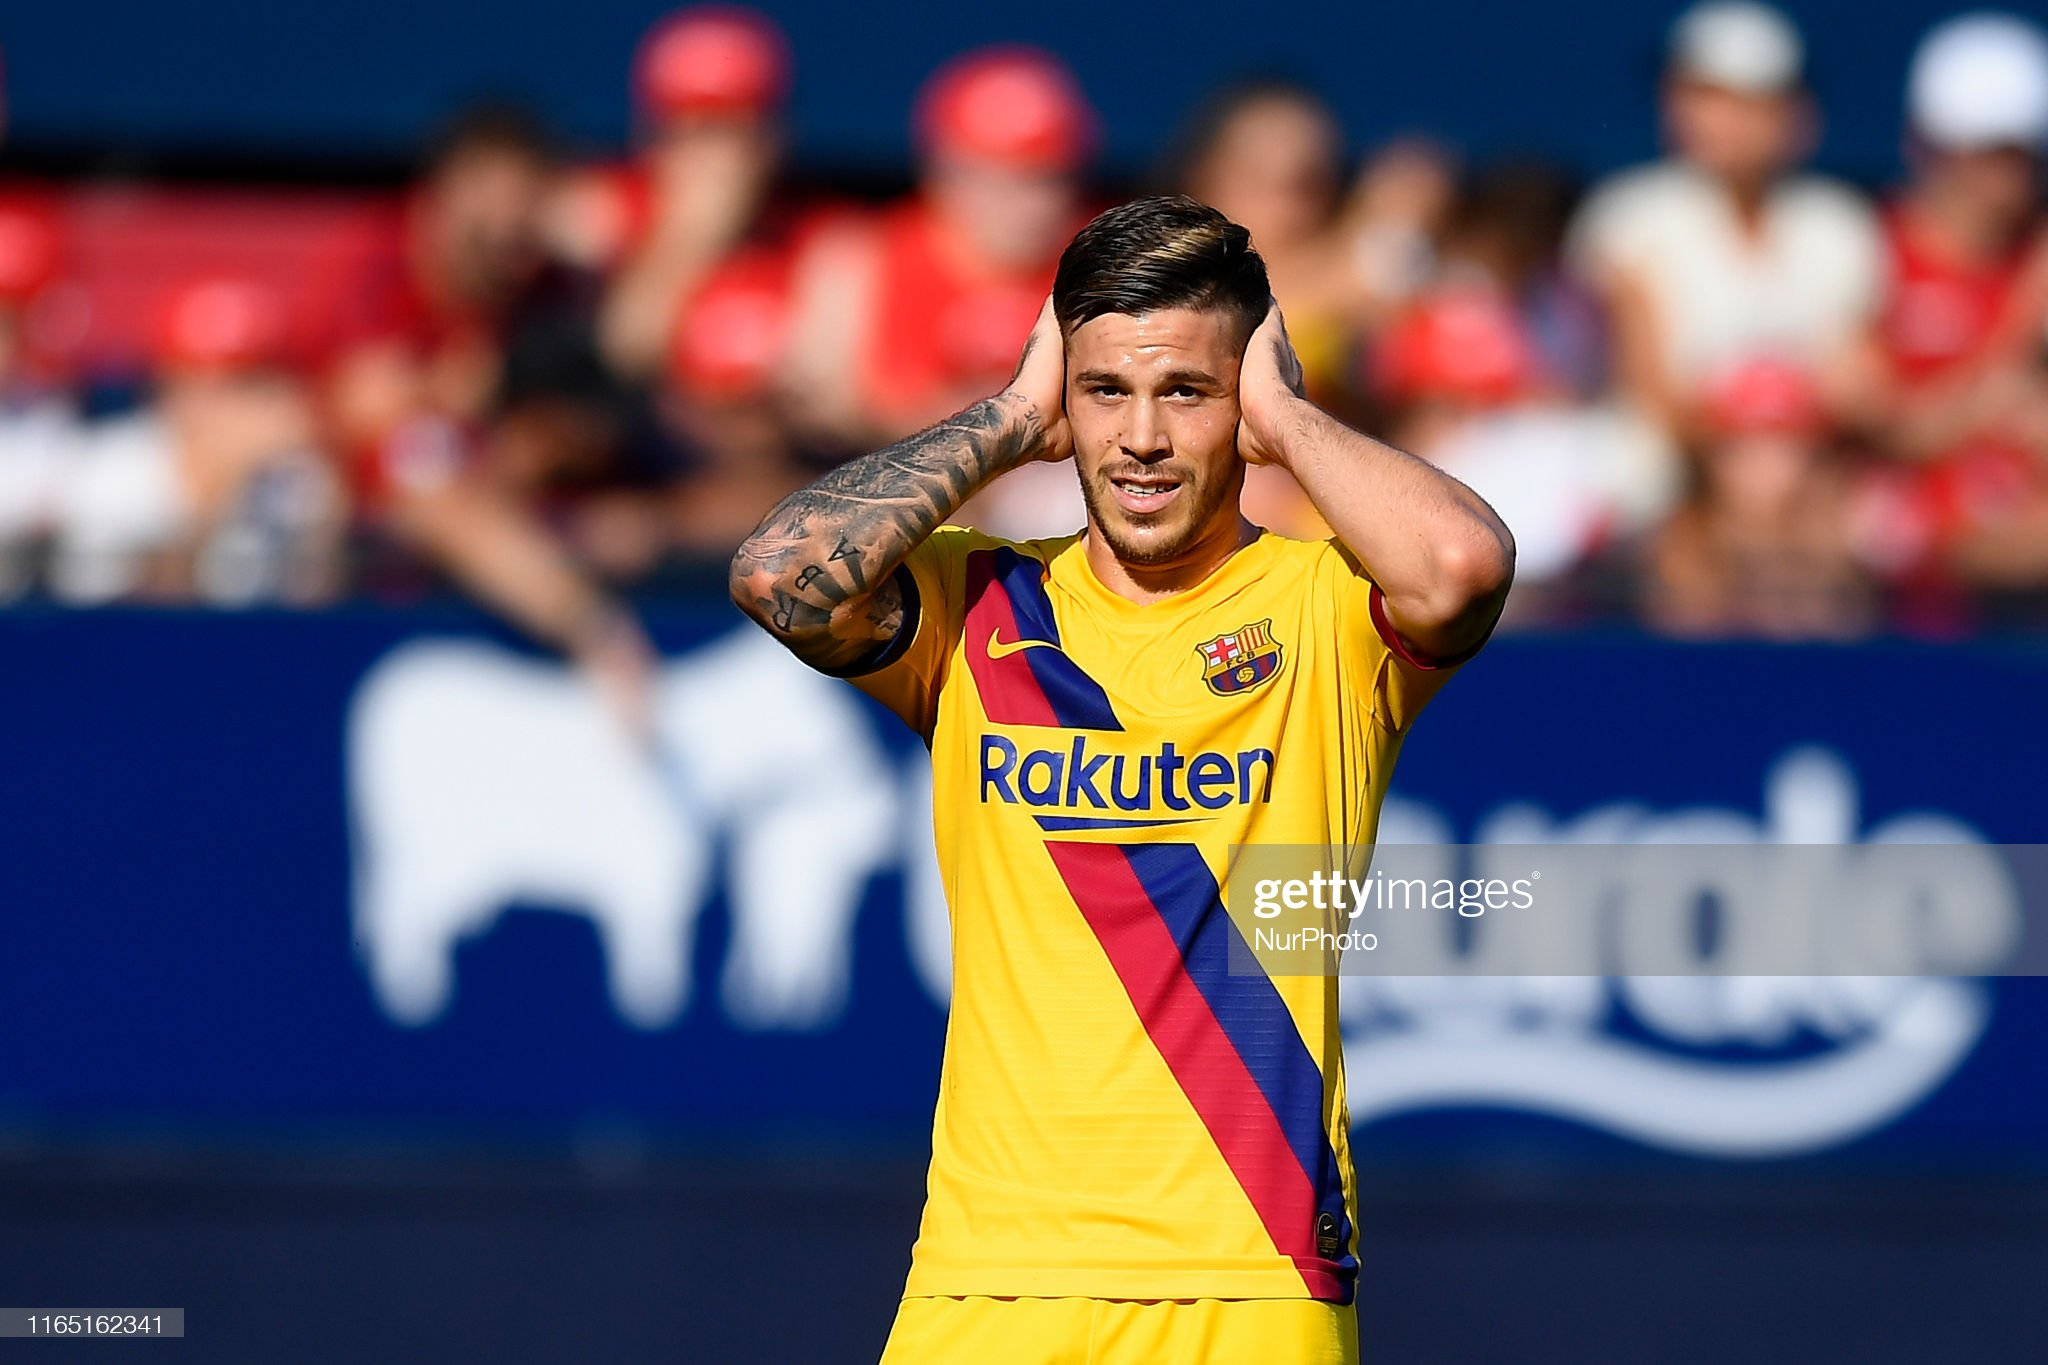 صور مباراة : أوساسونا - برشلونة 2-2 ( 31-08-2019 )  Carles-perez-of-barcelona-lament-a-failed-occasion-during-the-liga-picture-id1165162341?s=2048x2048